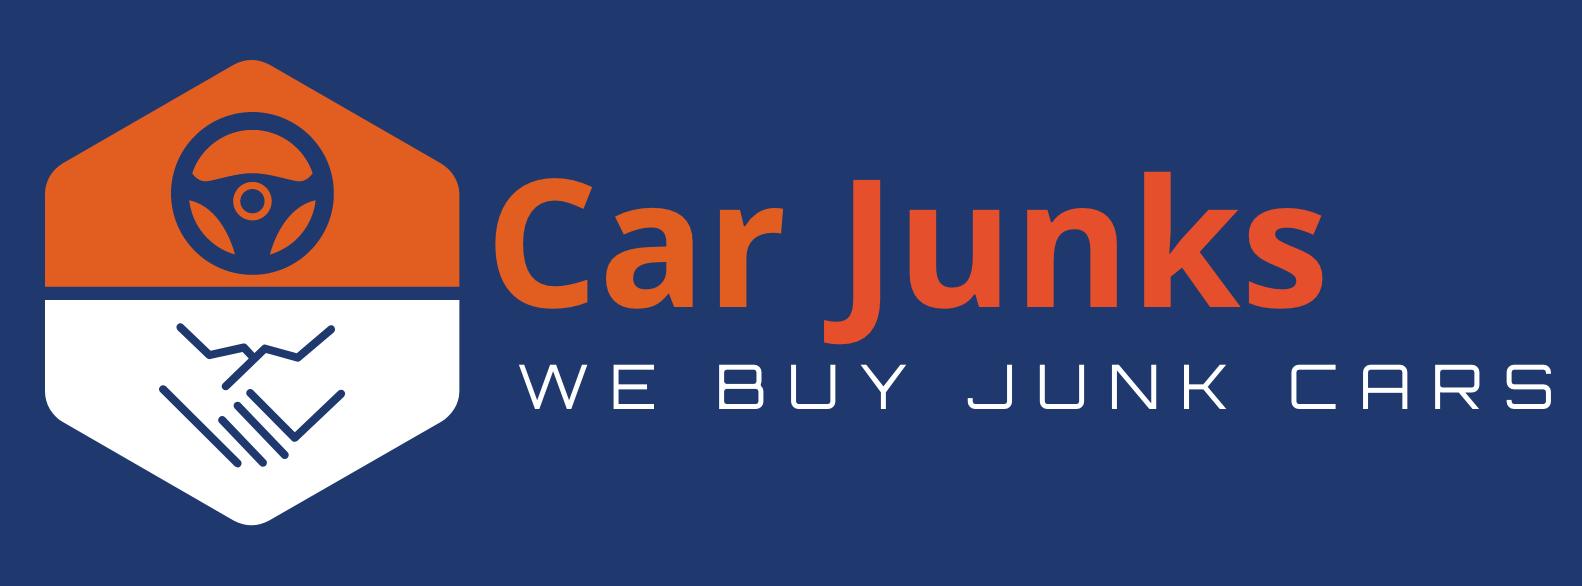 CarJunks.com